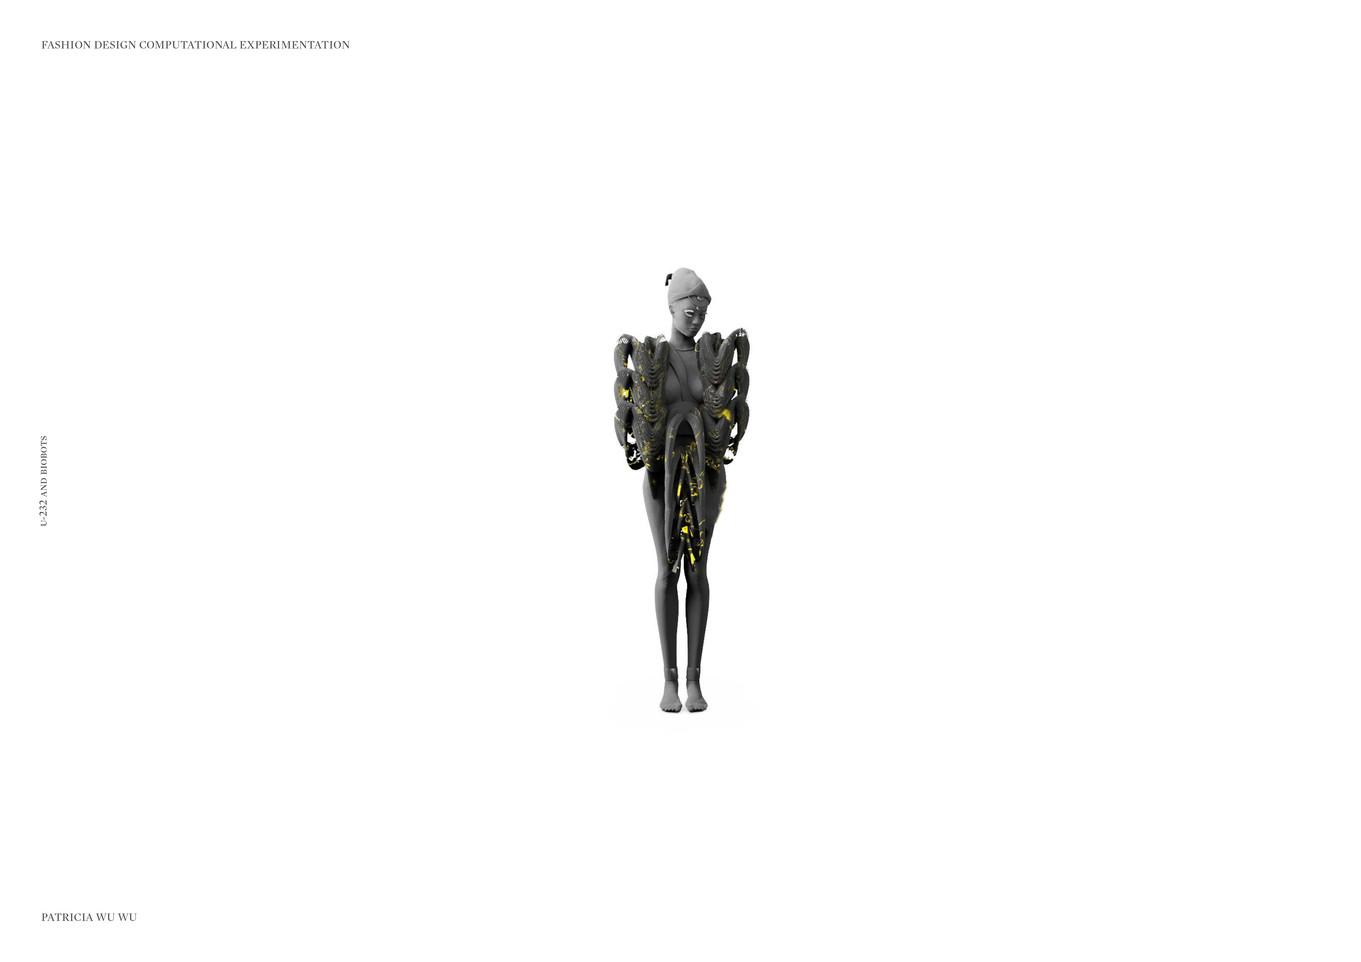 u-232 and biobots6.jpg